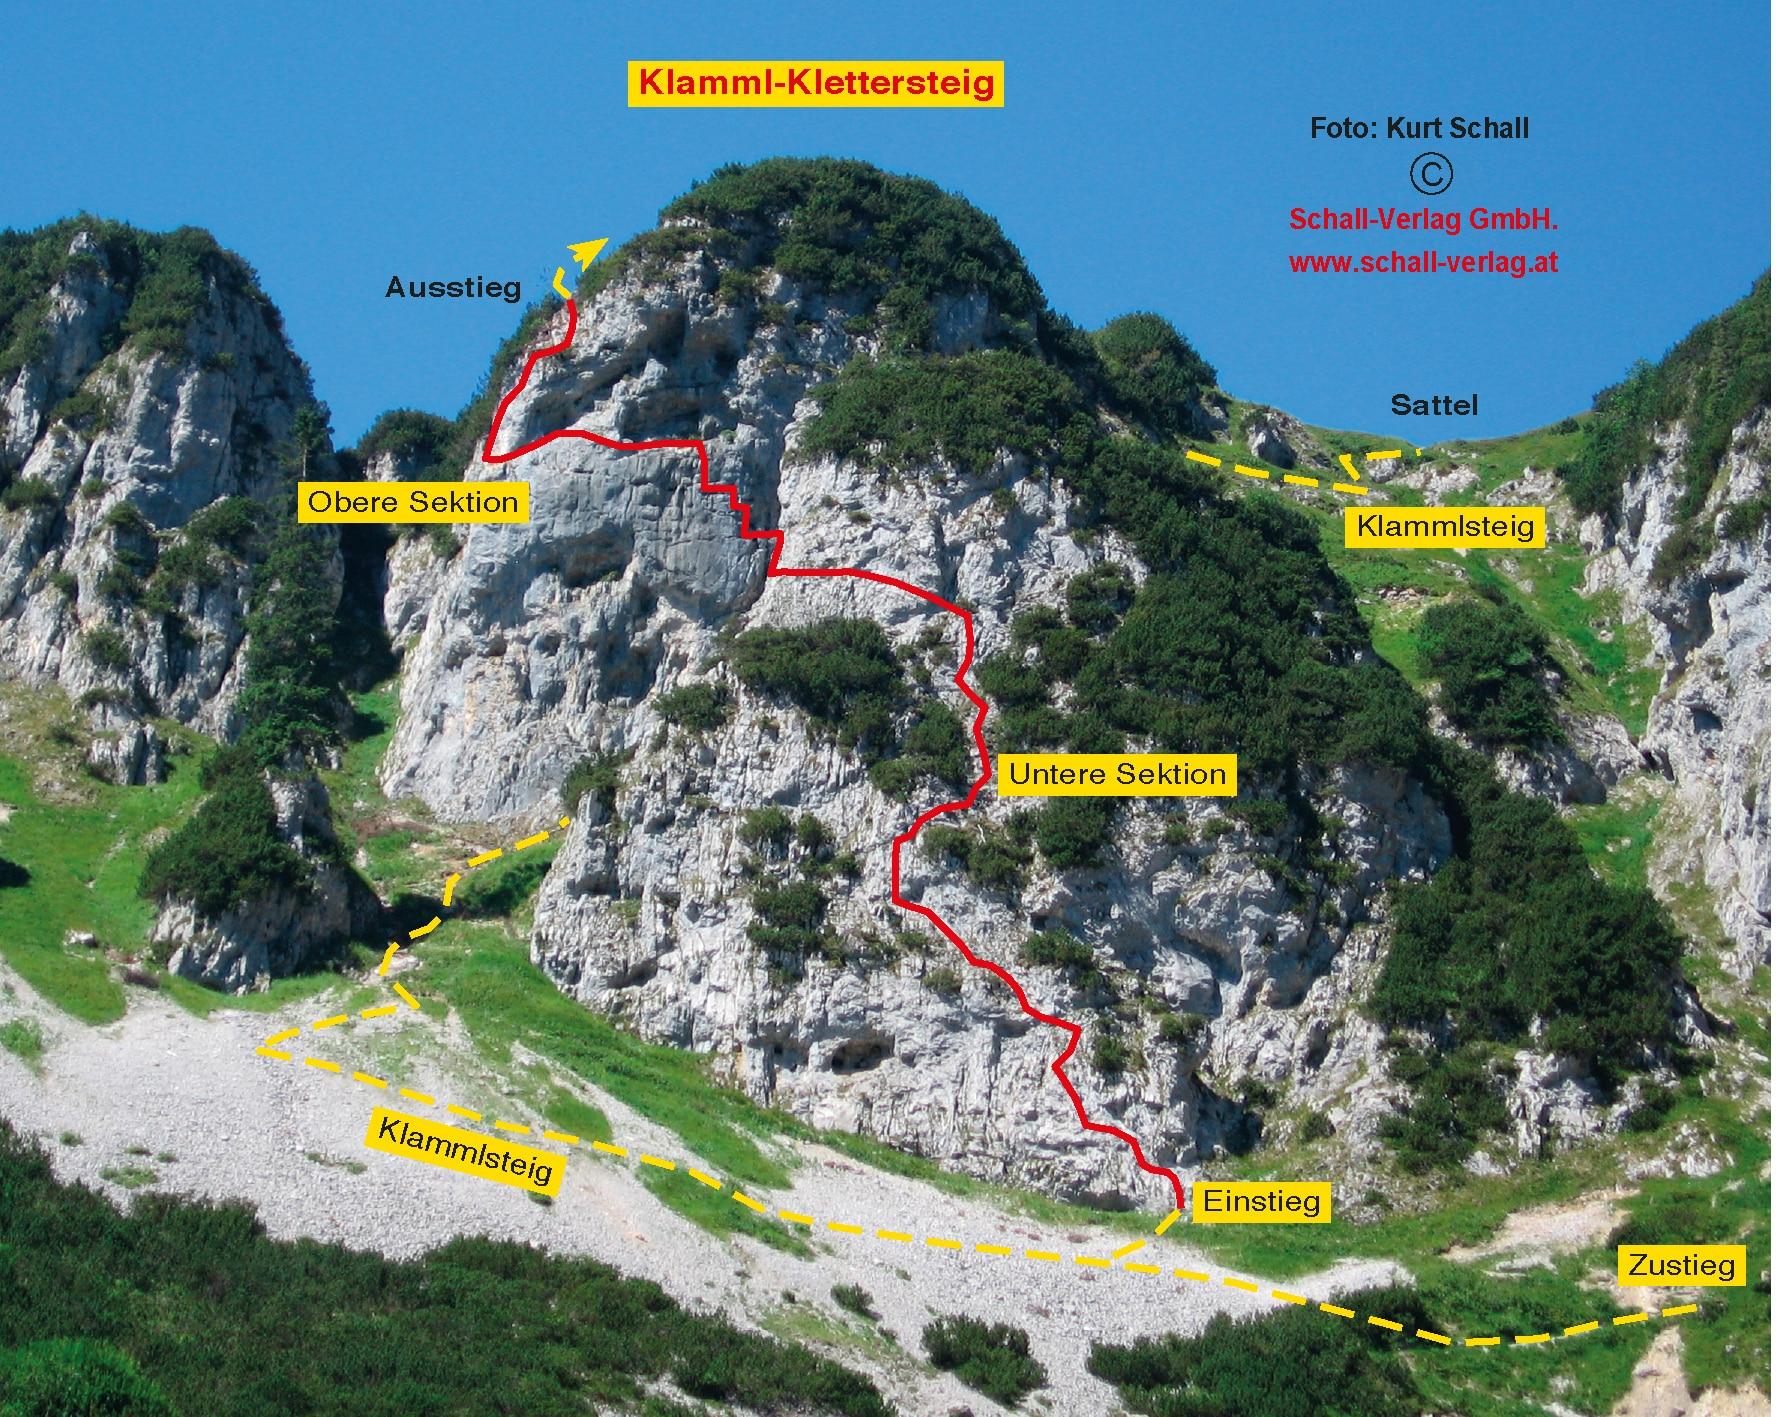 Klettersteig Map : Klettersteige klamml klettersteig km bergwelten